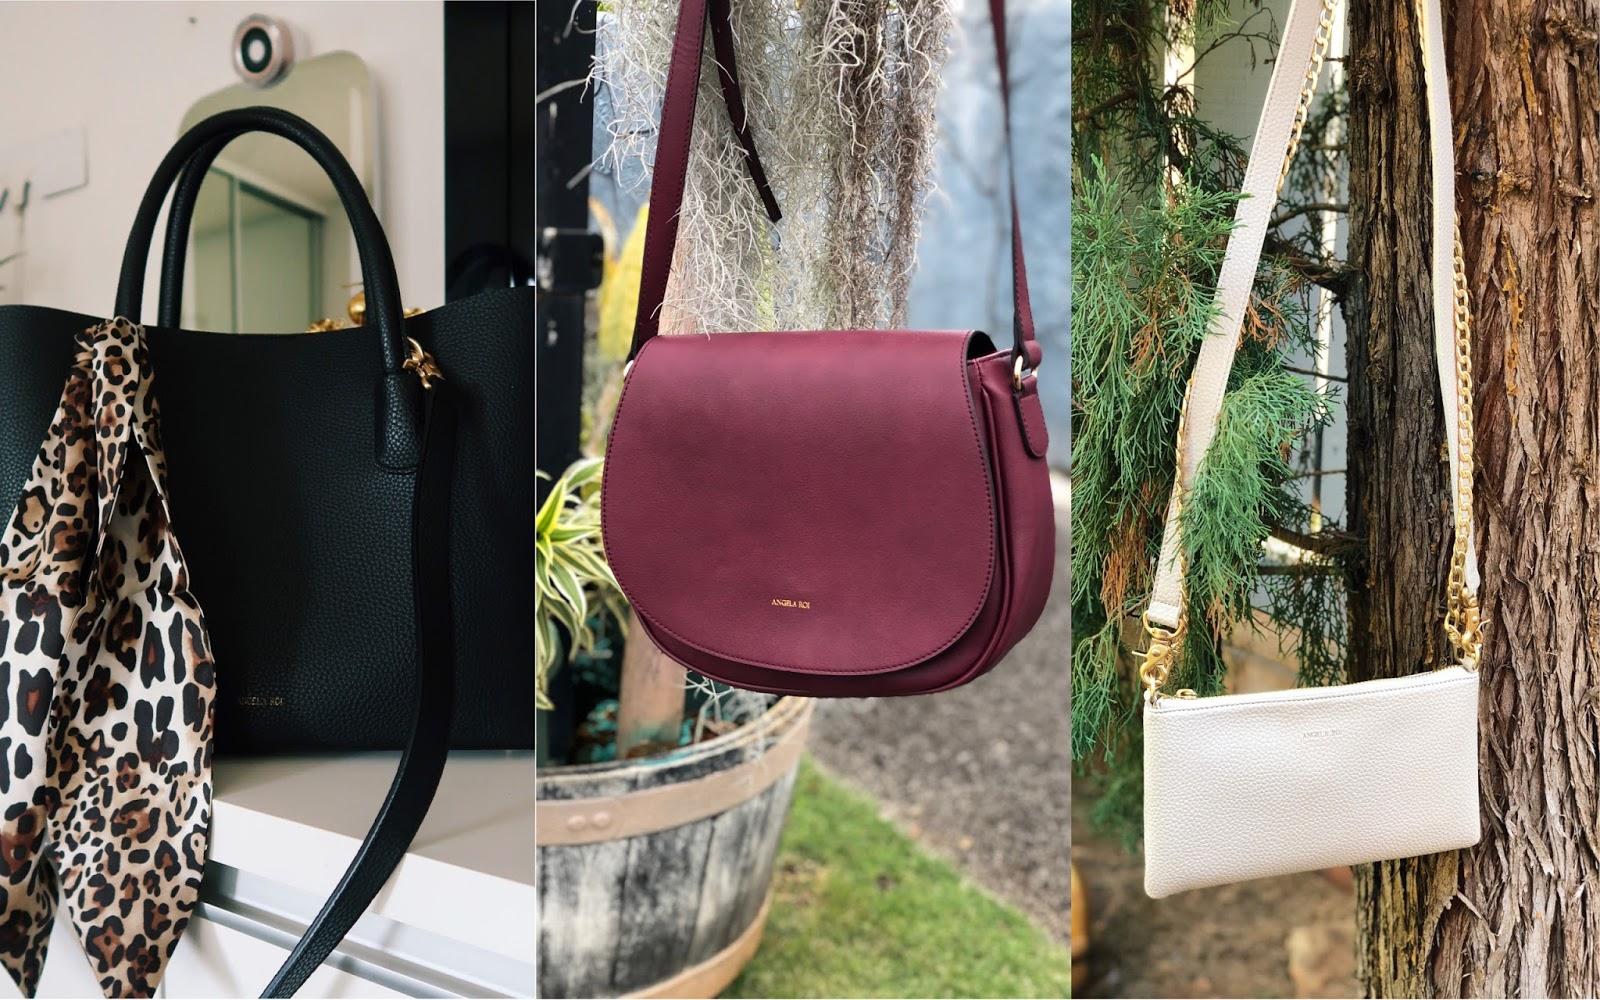 Angela Roi Handbag Collection, Review Angela Roi Handbags